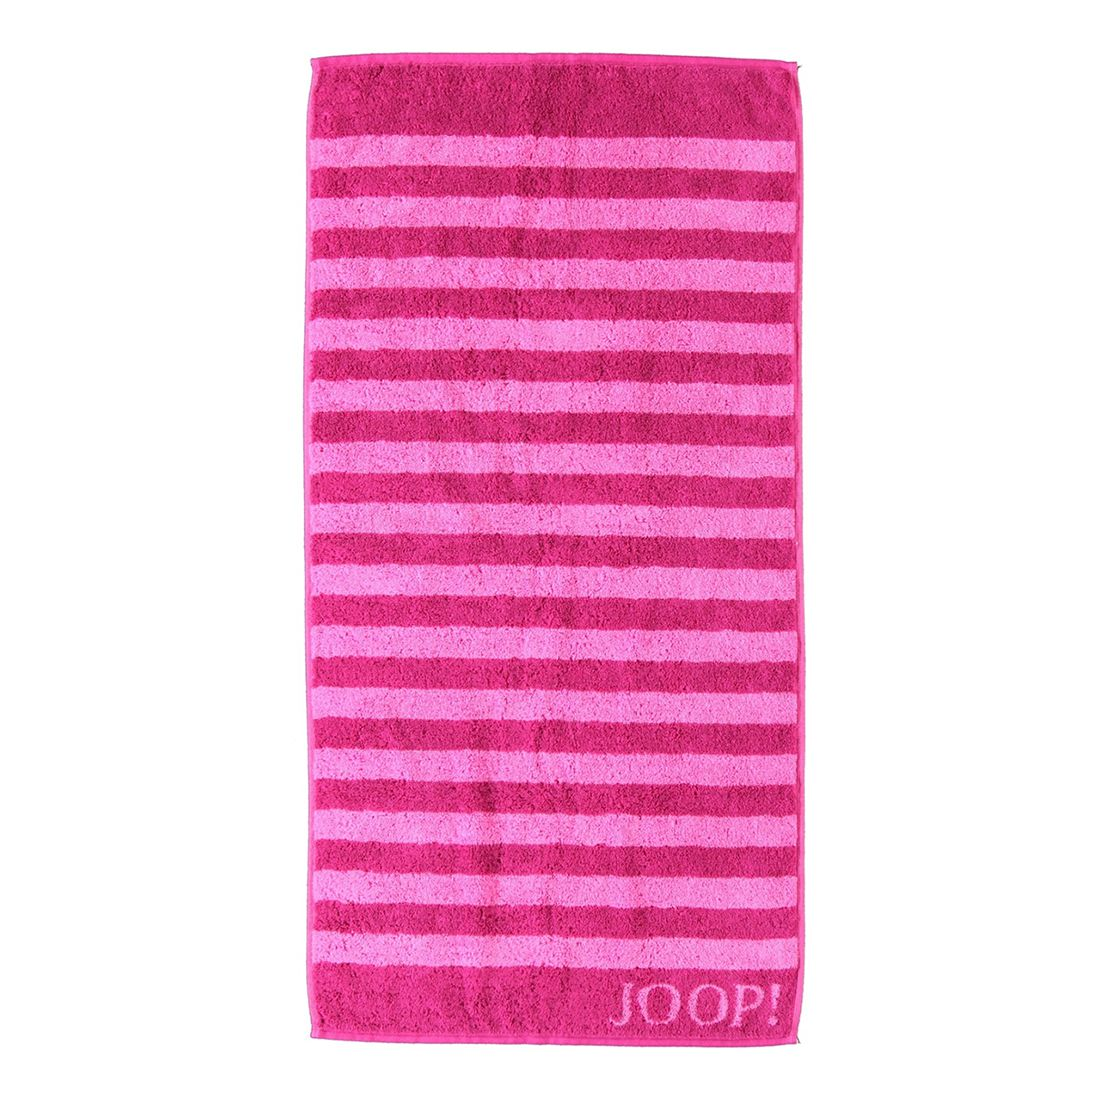 Handtuch Classic Stripes – 100% Baumwolle Cassis – 22 – Handtuch: 50 x 100 cm, Joop bestellen